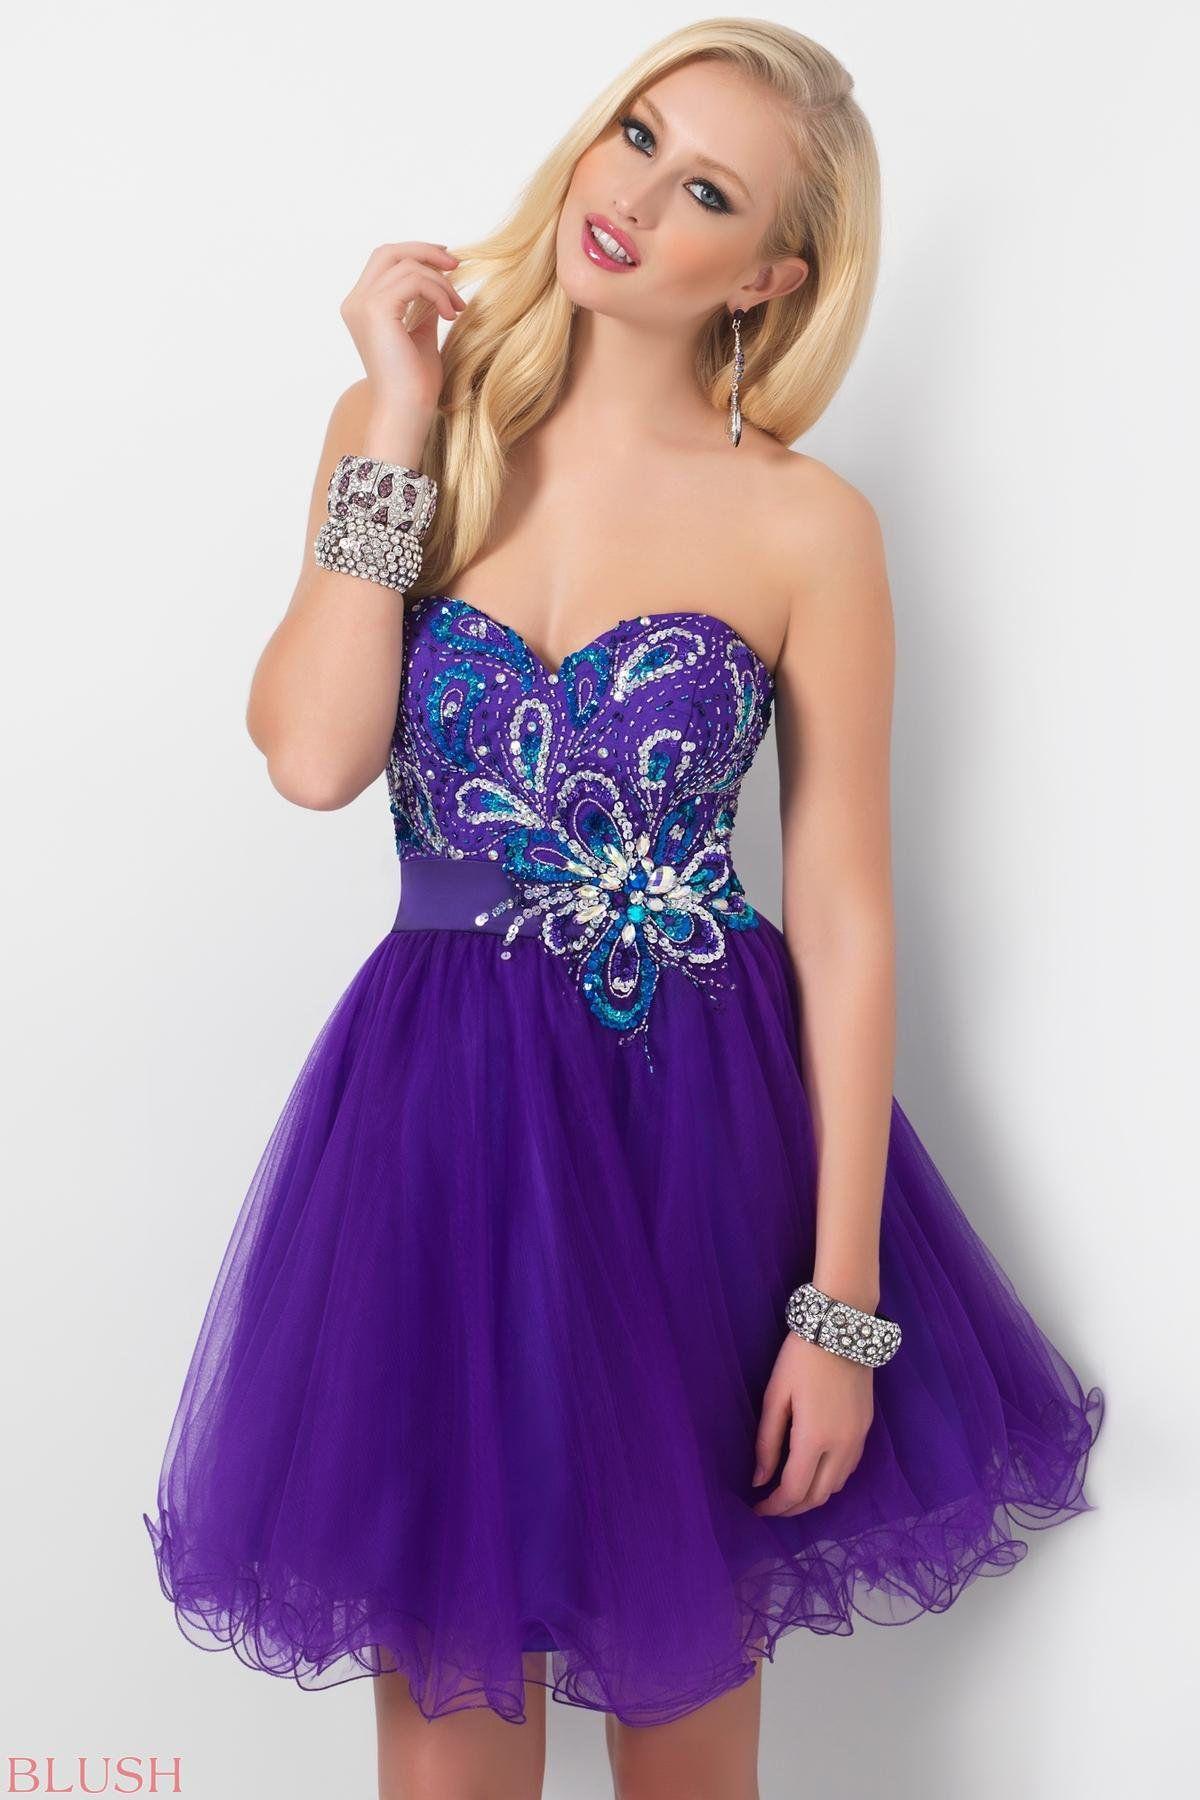 Pin de nelie ras en PROM DRESSES | Pinterest | Vestidos de fiesta ...